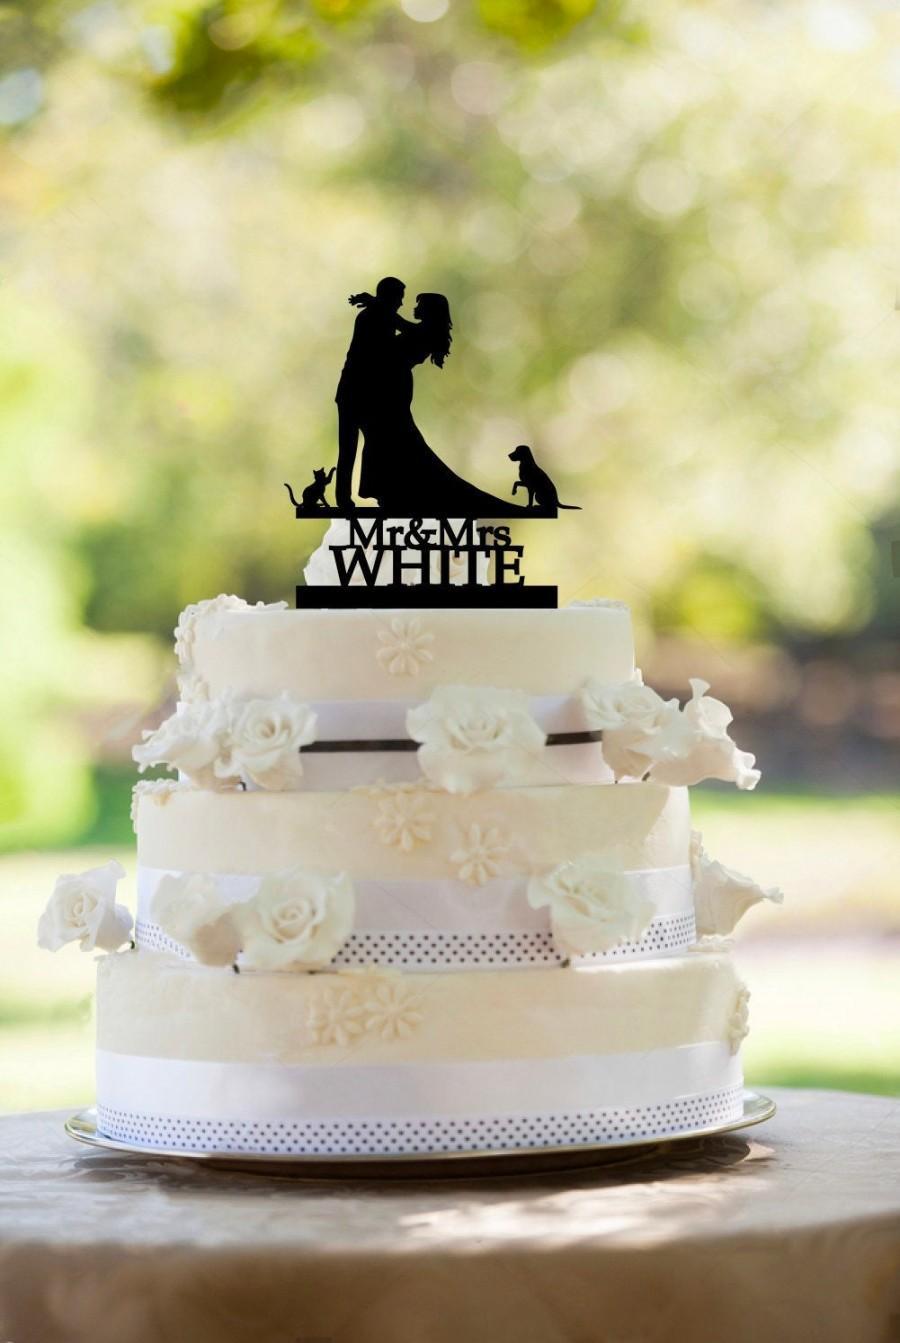 Wedding - Wedding cake topper,Personalized wedding cake topper,Cake topper wedding,Custom wedding cake topper,Wedding topper,Cake topper with dog